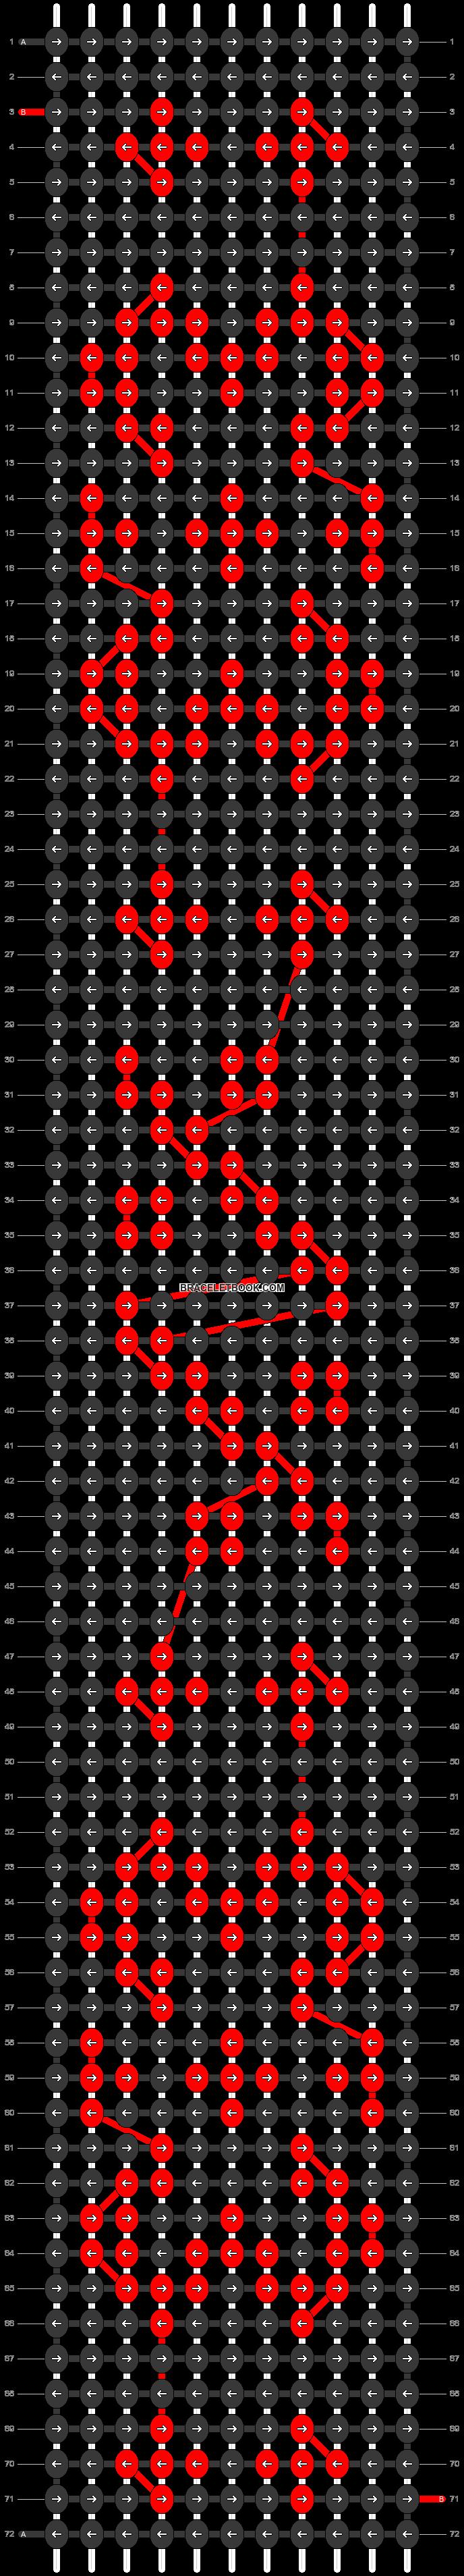 Alpha Pattern #22399 added by biancaplem